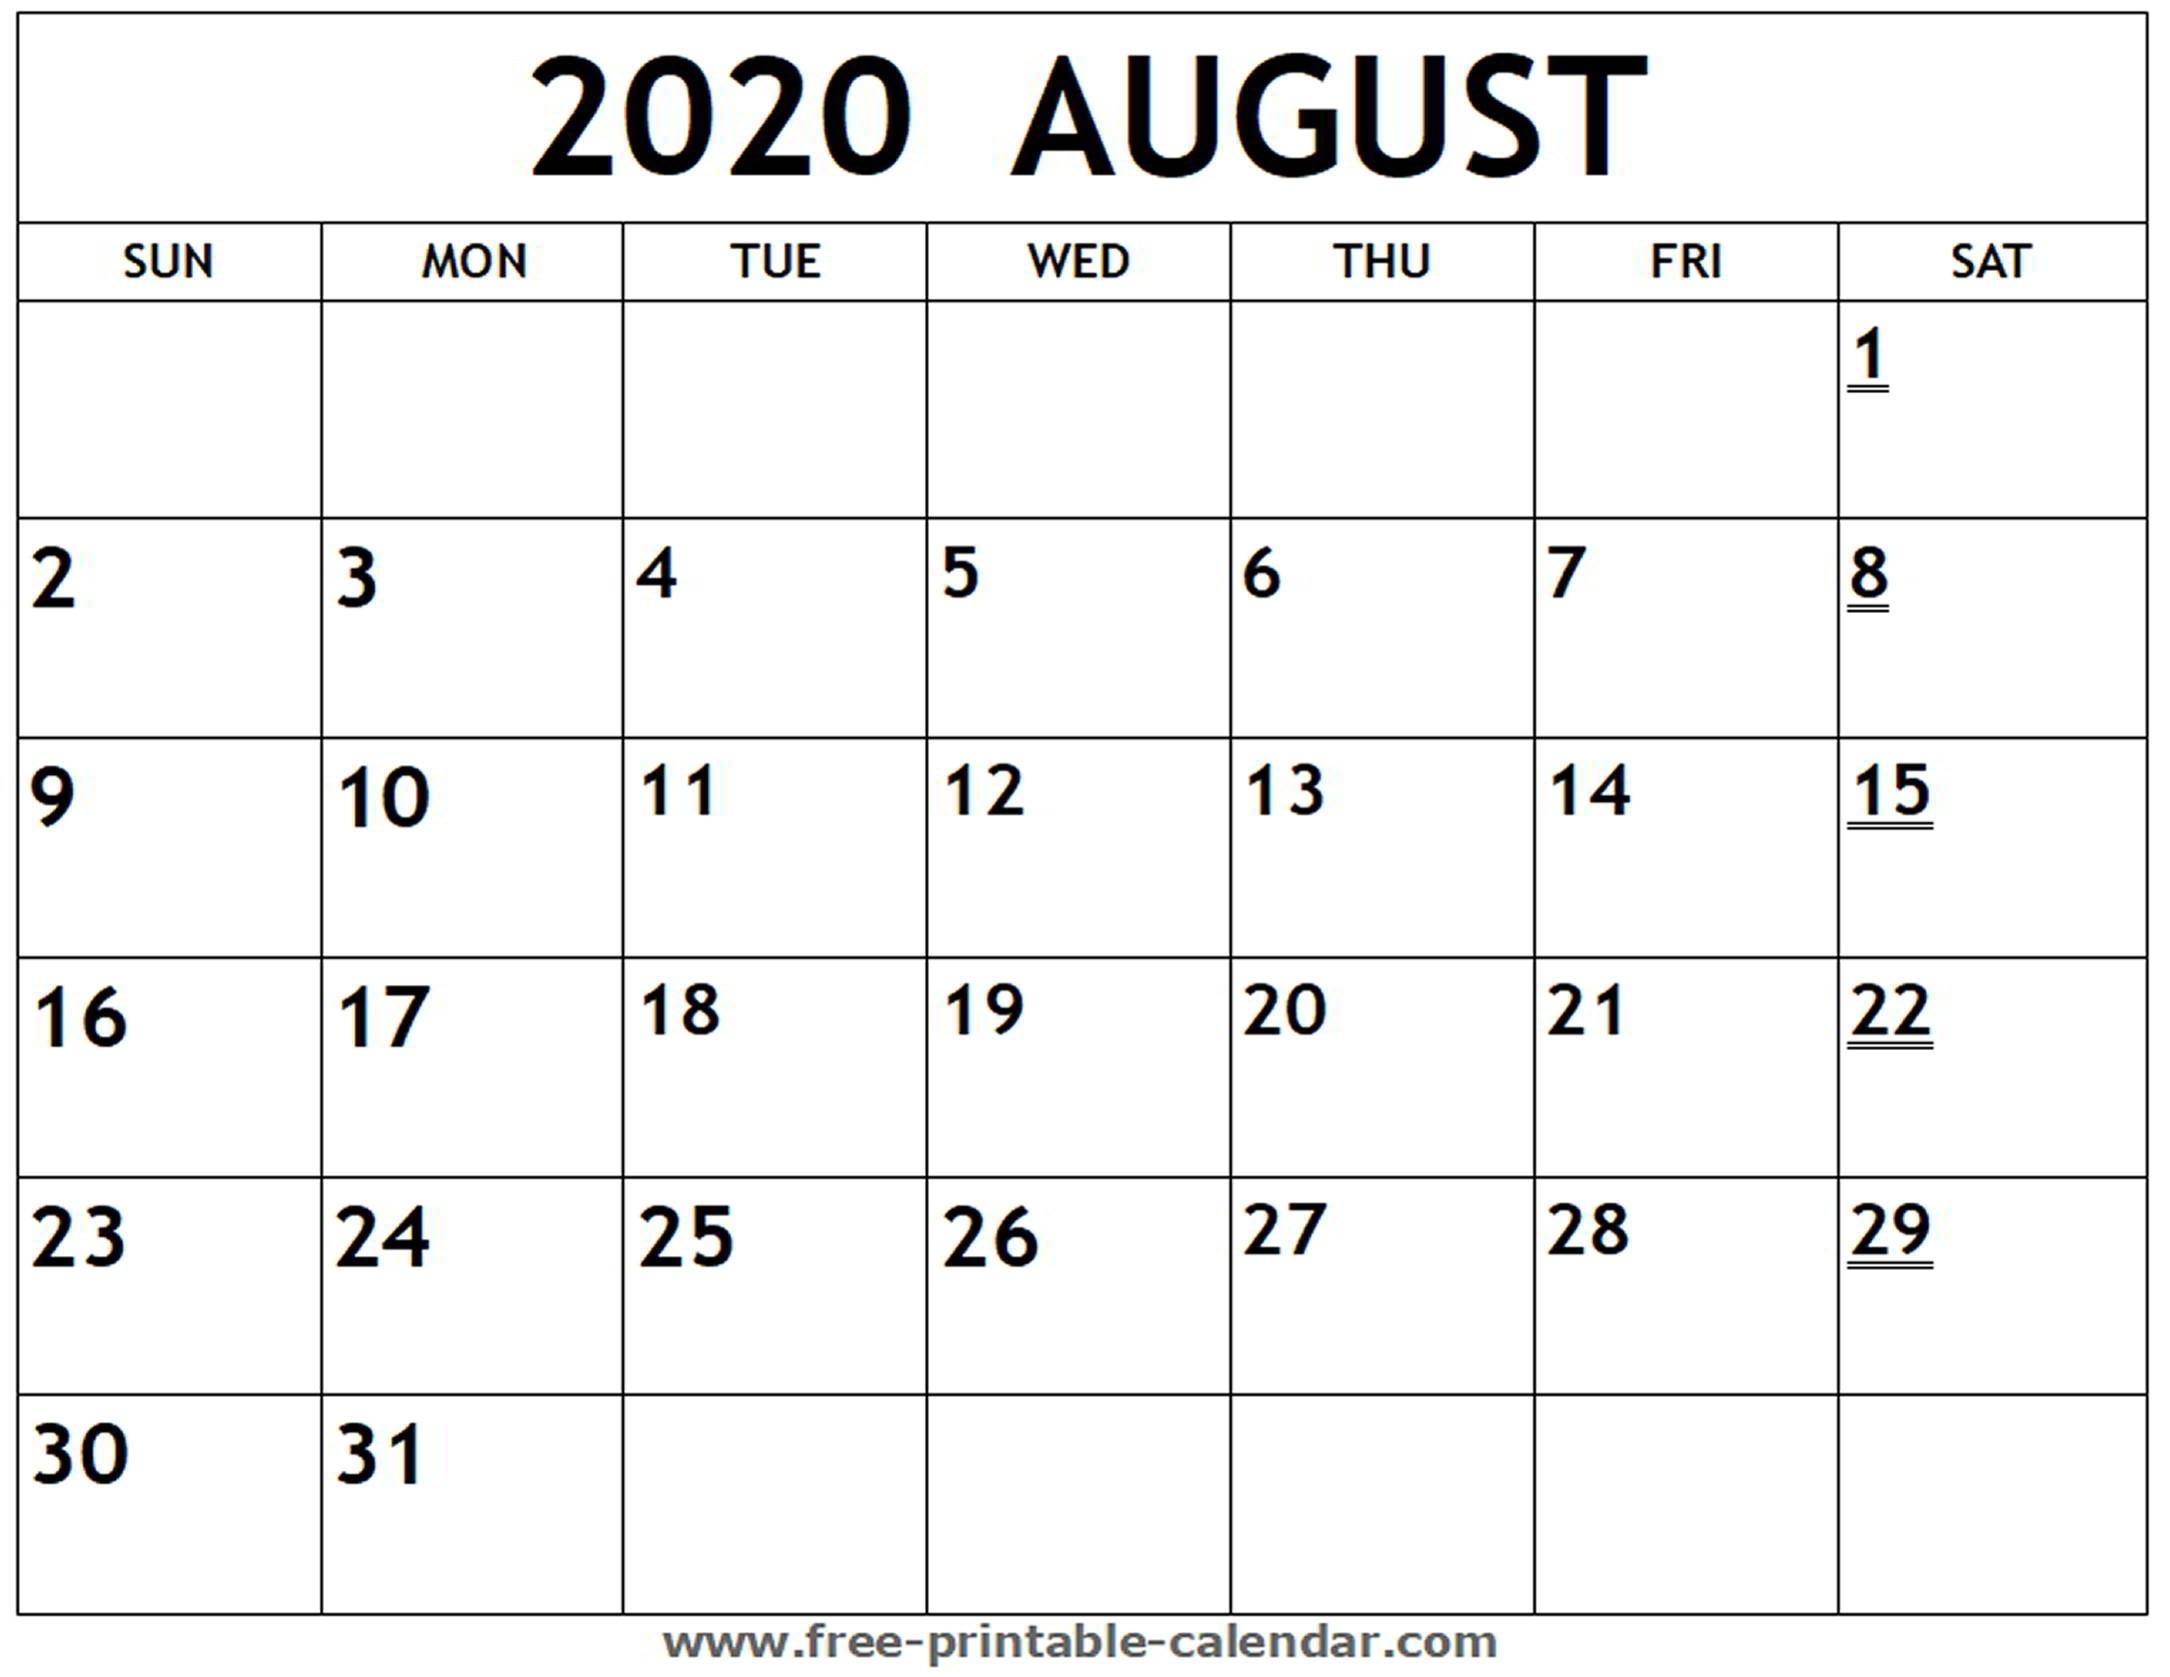 Printable 2020 August Calendar - Free-Printable-Calendar  Blank Calendar For August 2020 Printable